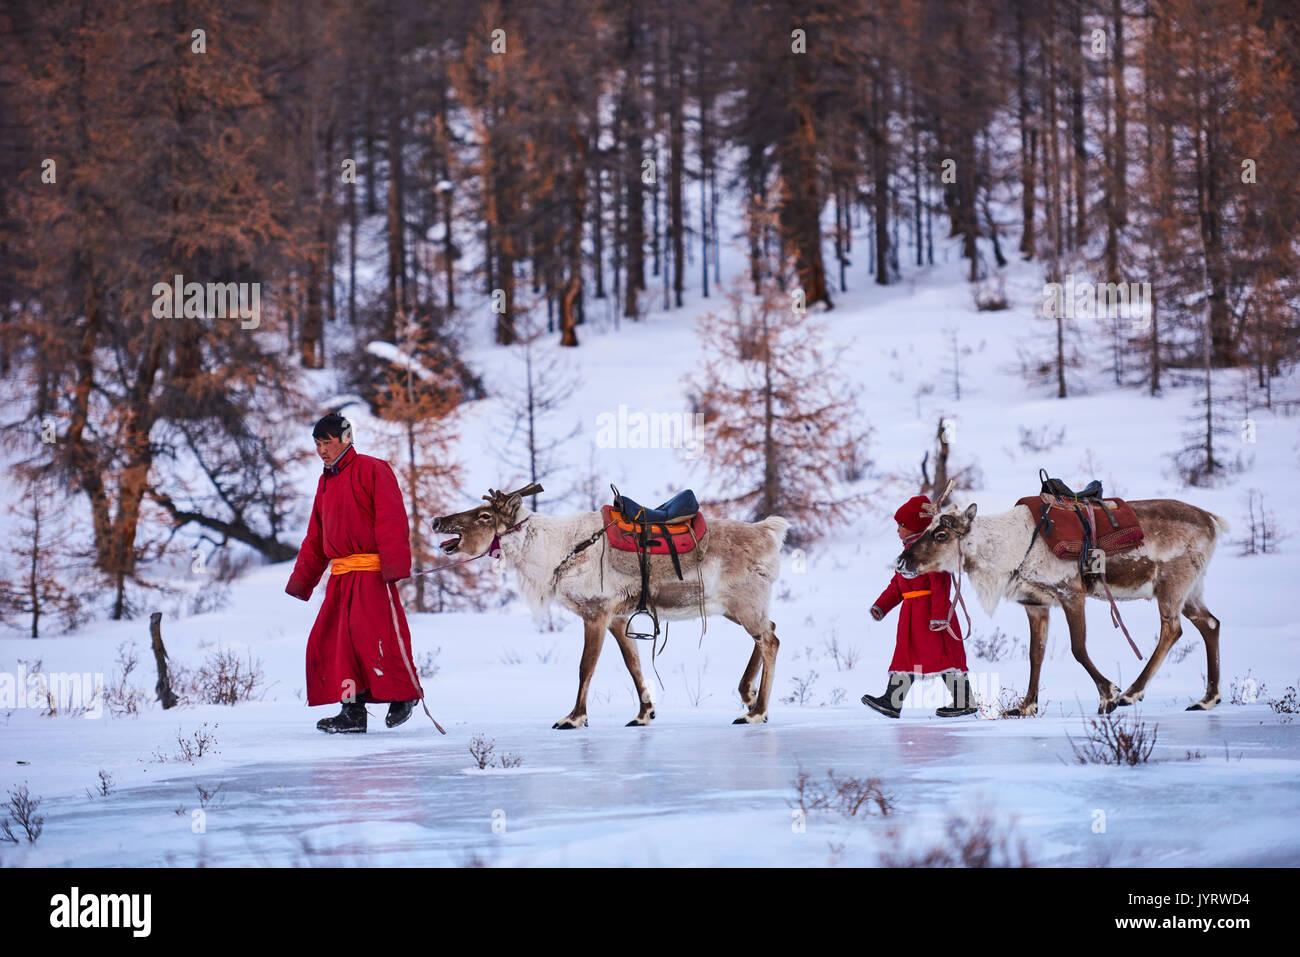 Mongolia, Khovsgol privince, the Tsaatan, reindeer herder, winter migration, crossing a frozen river Stock Photo